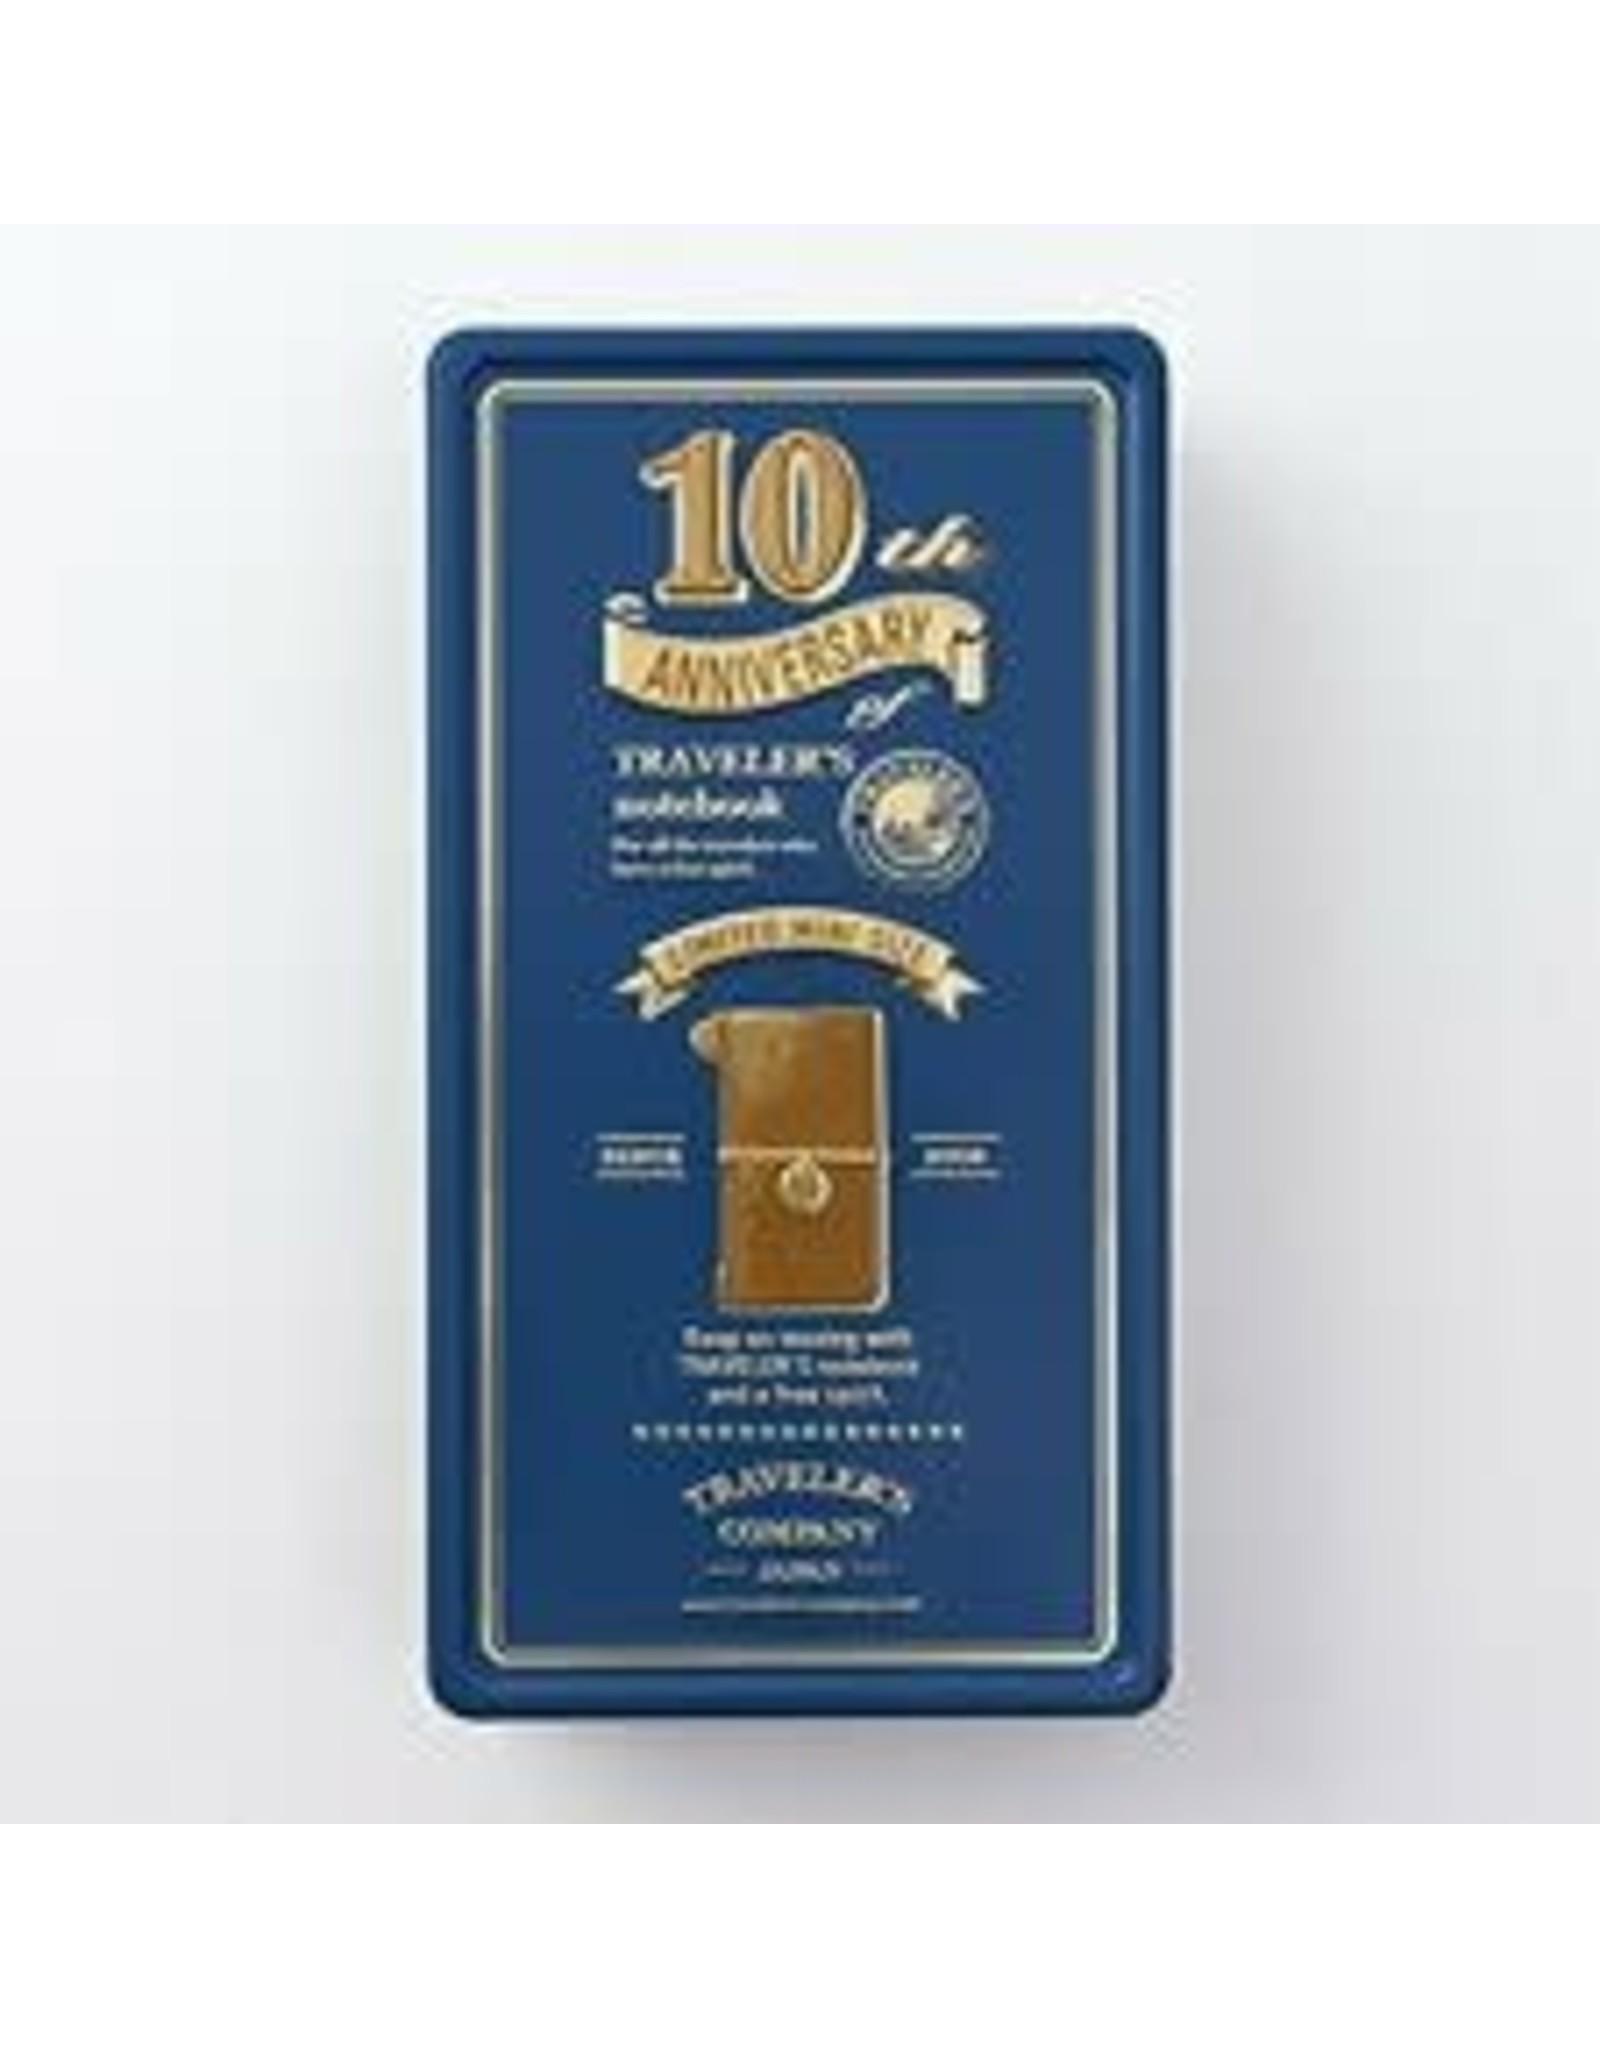 Traveler's Company TRAVELER'S NOTEBOOK MINI 10TH ANNIVERSARY CAMEL